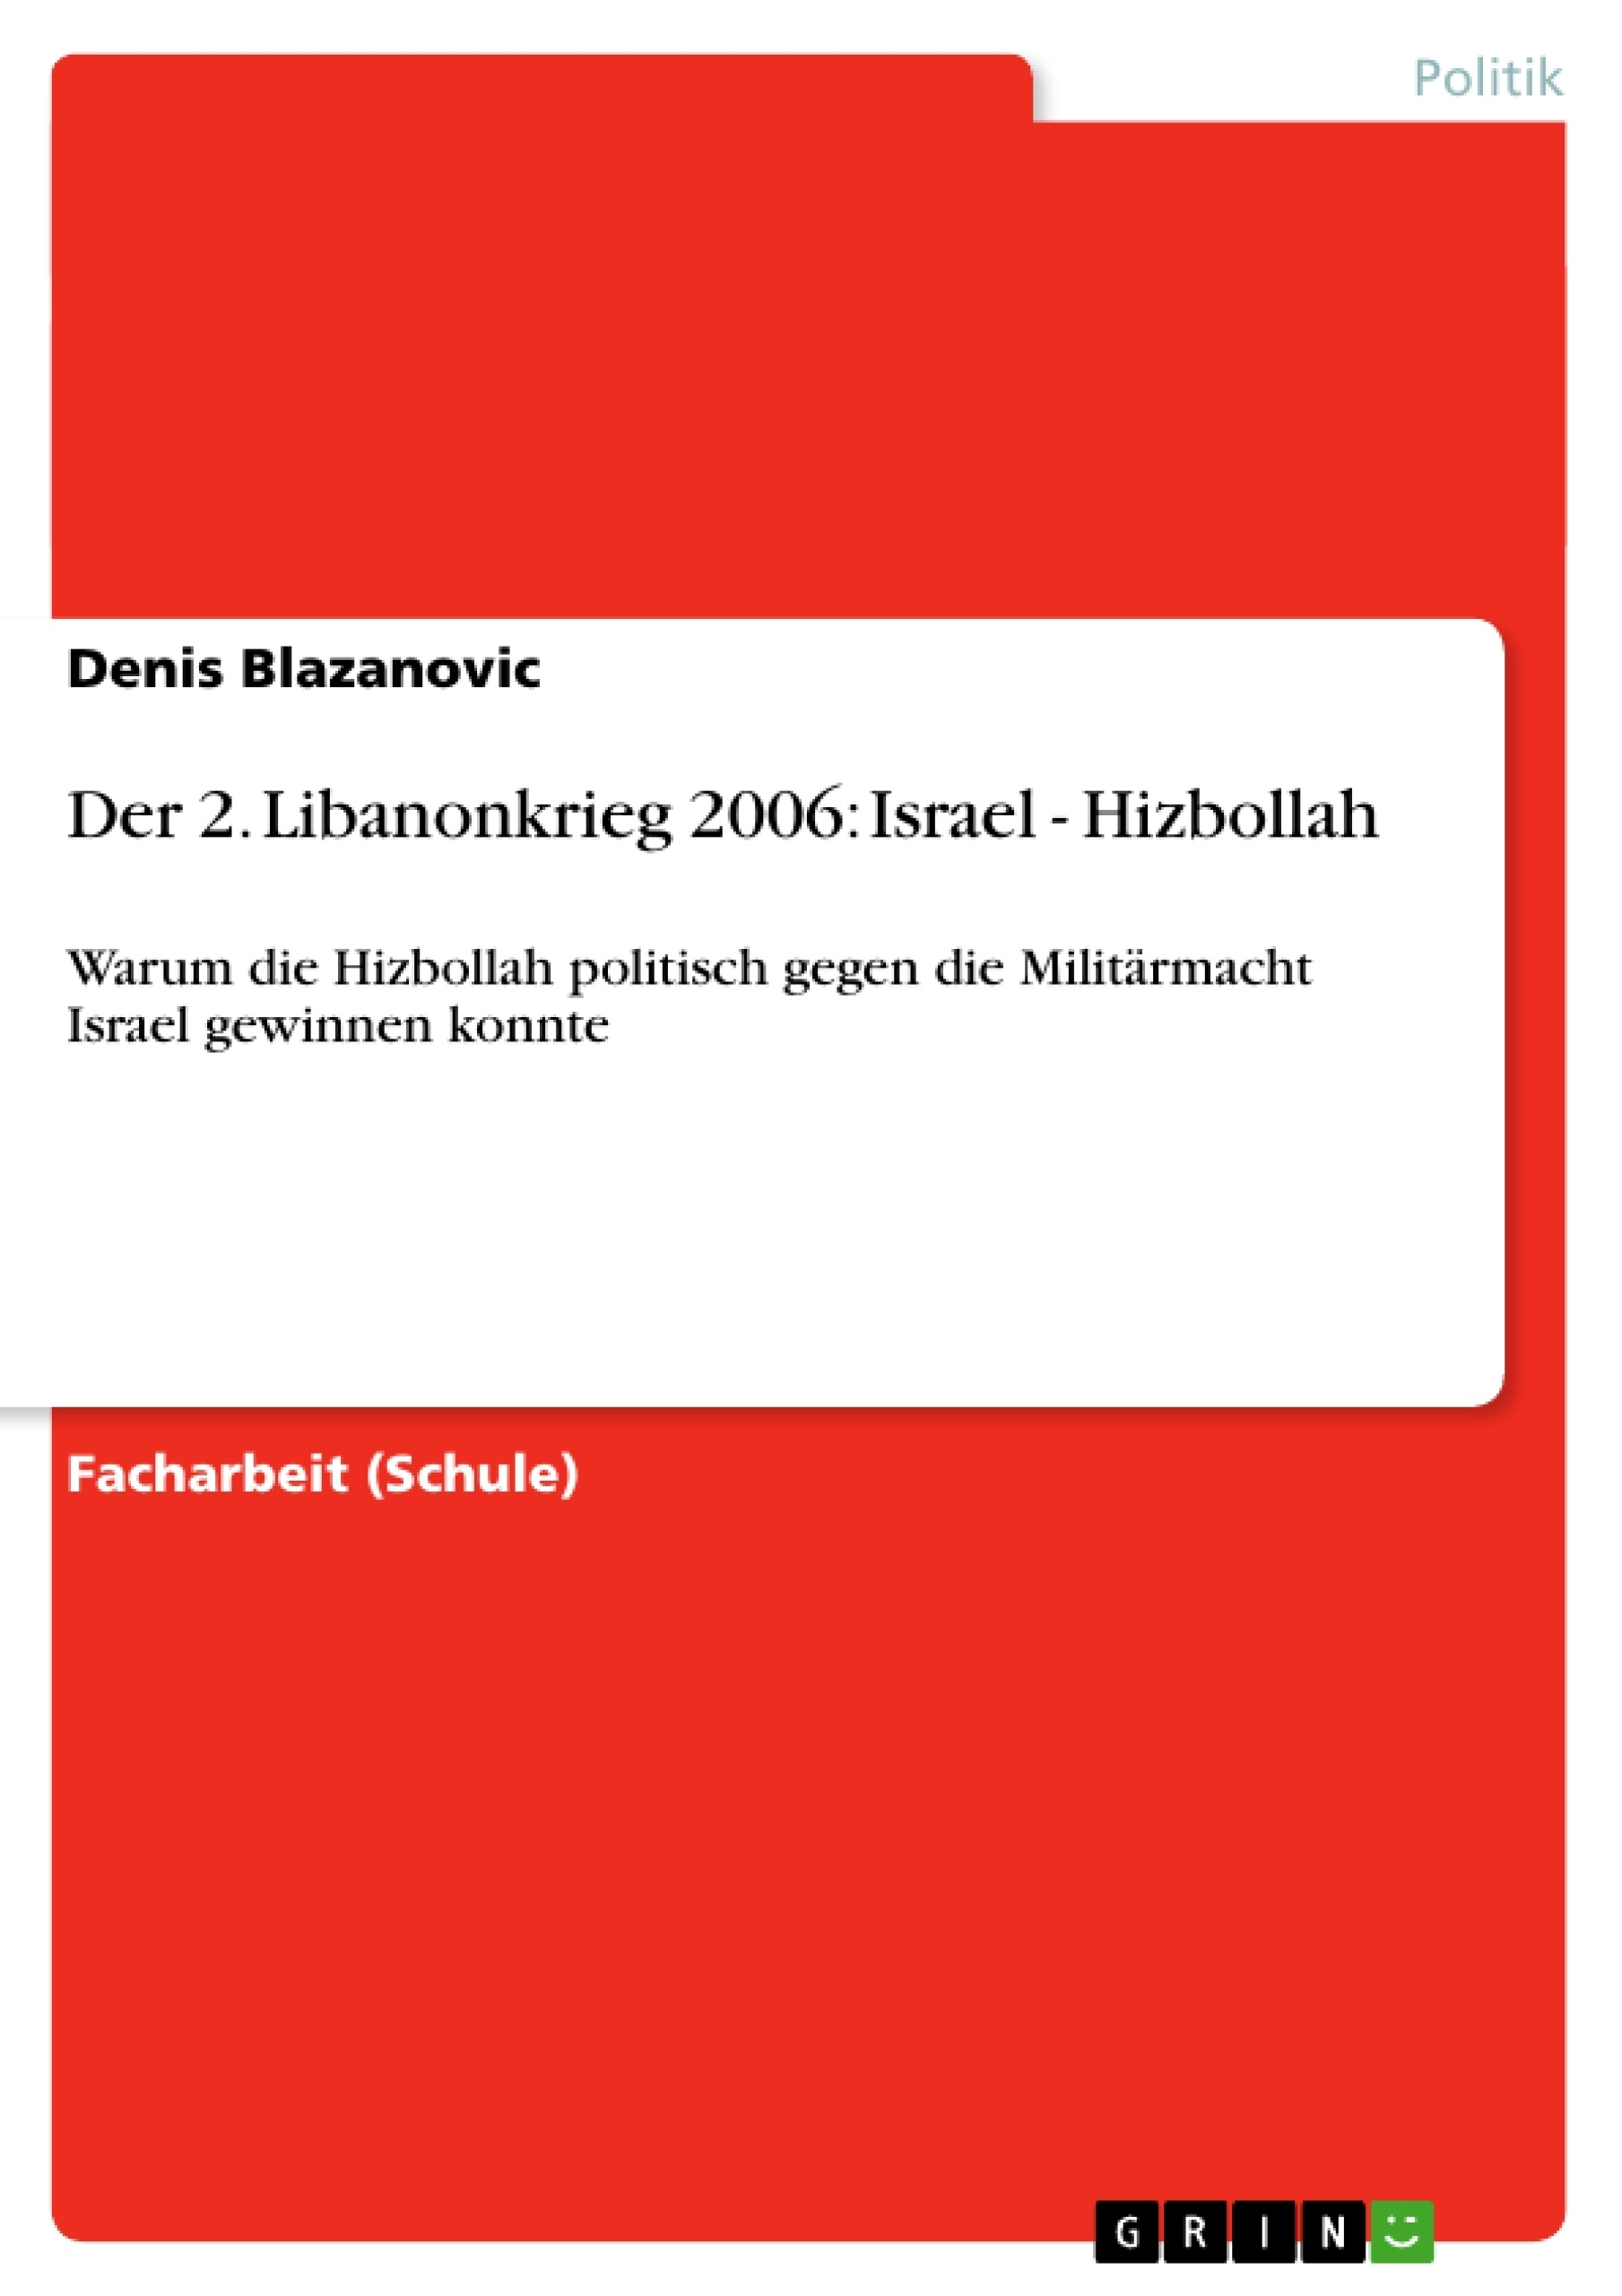 Titel: Der 2. Libanonkrieg 2006:  Israel - Hizbollah